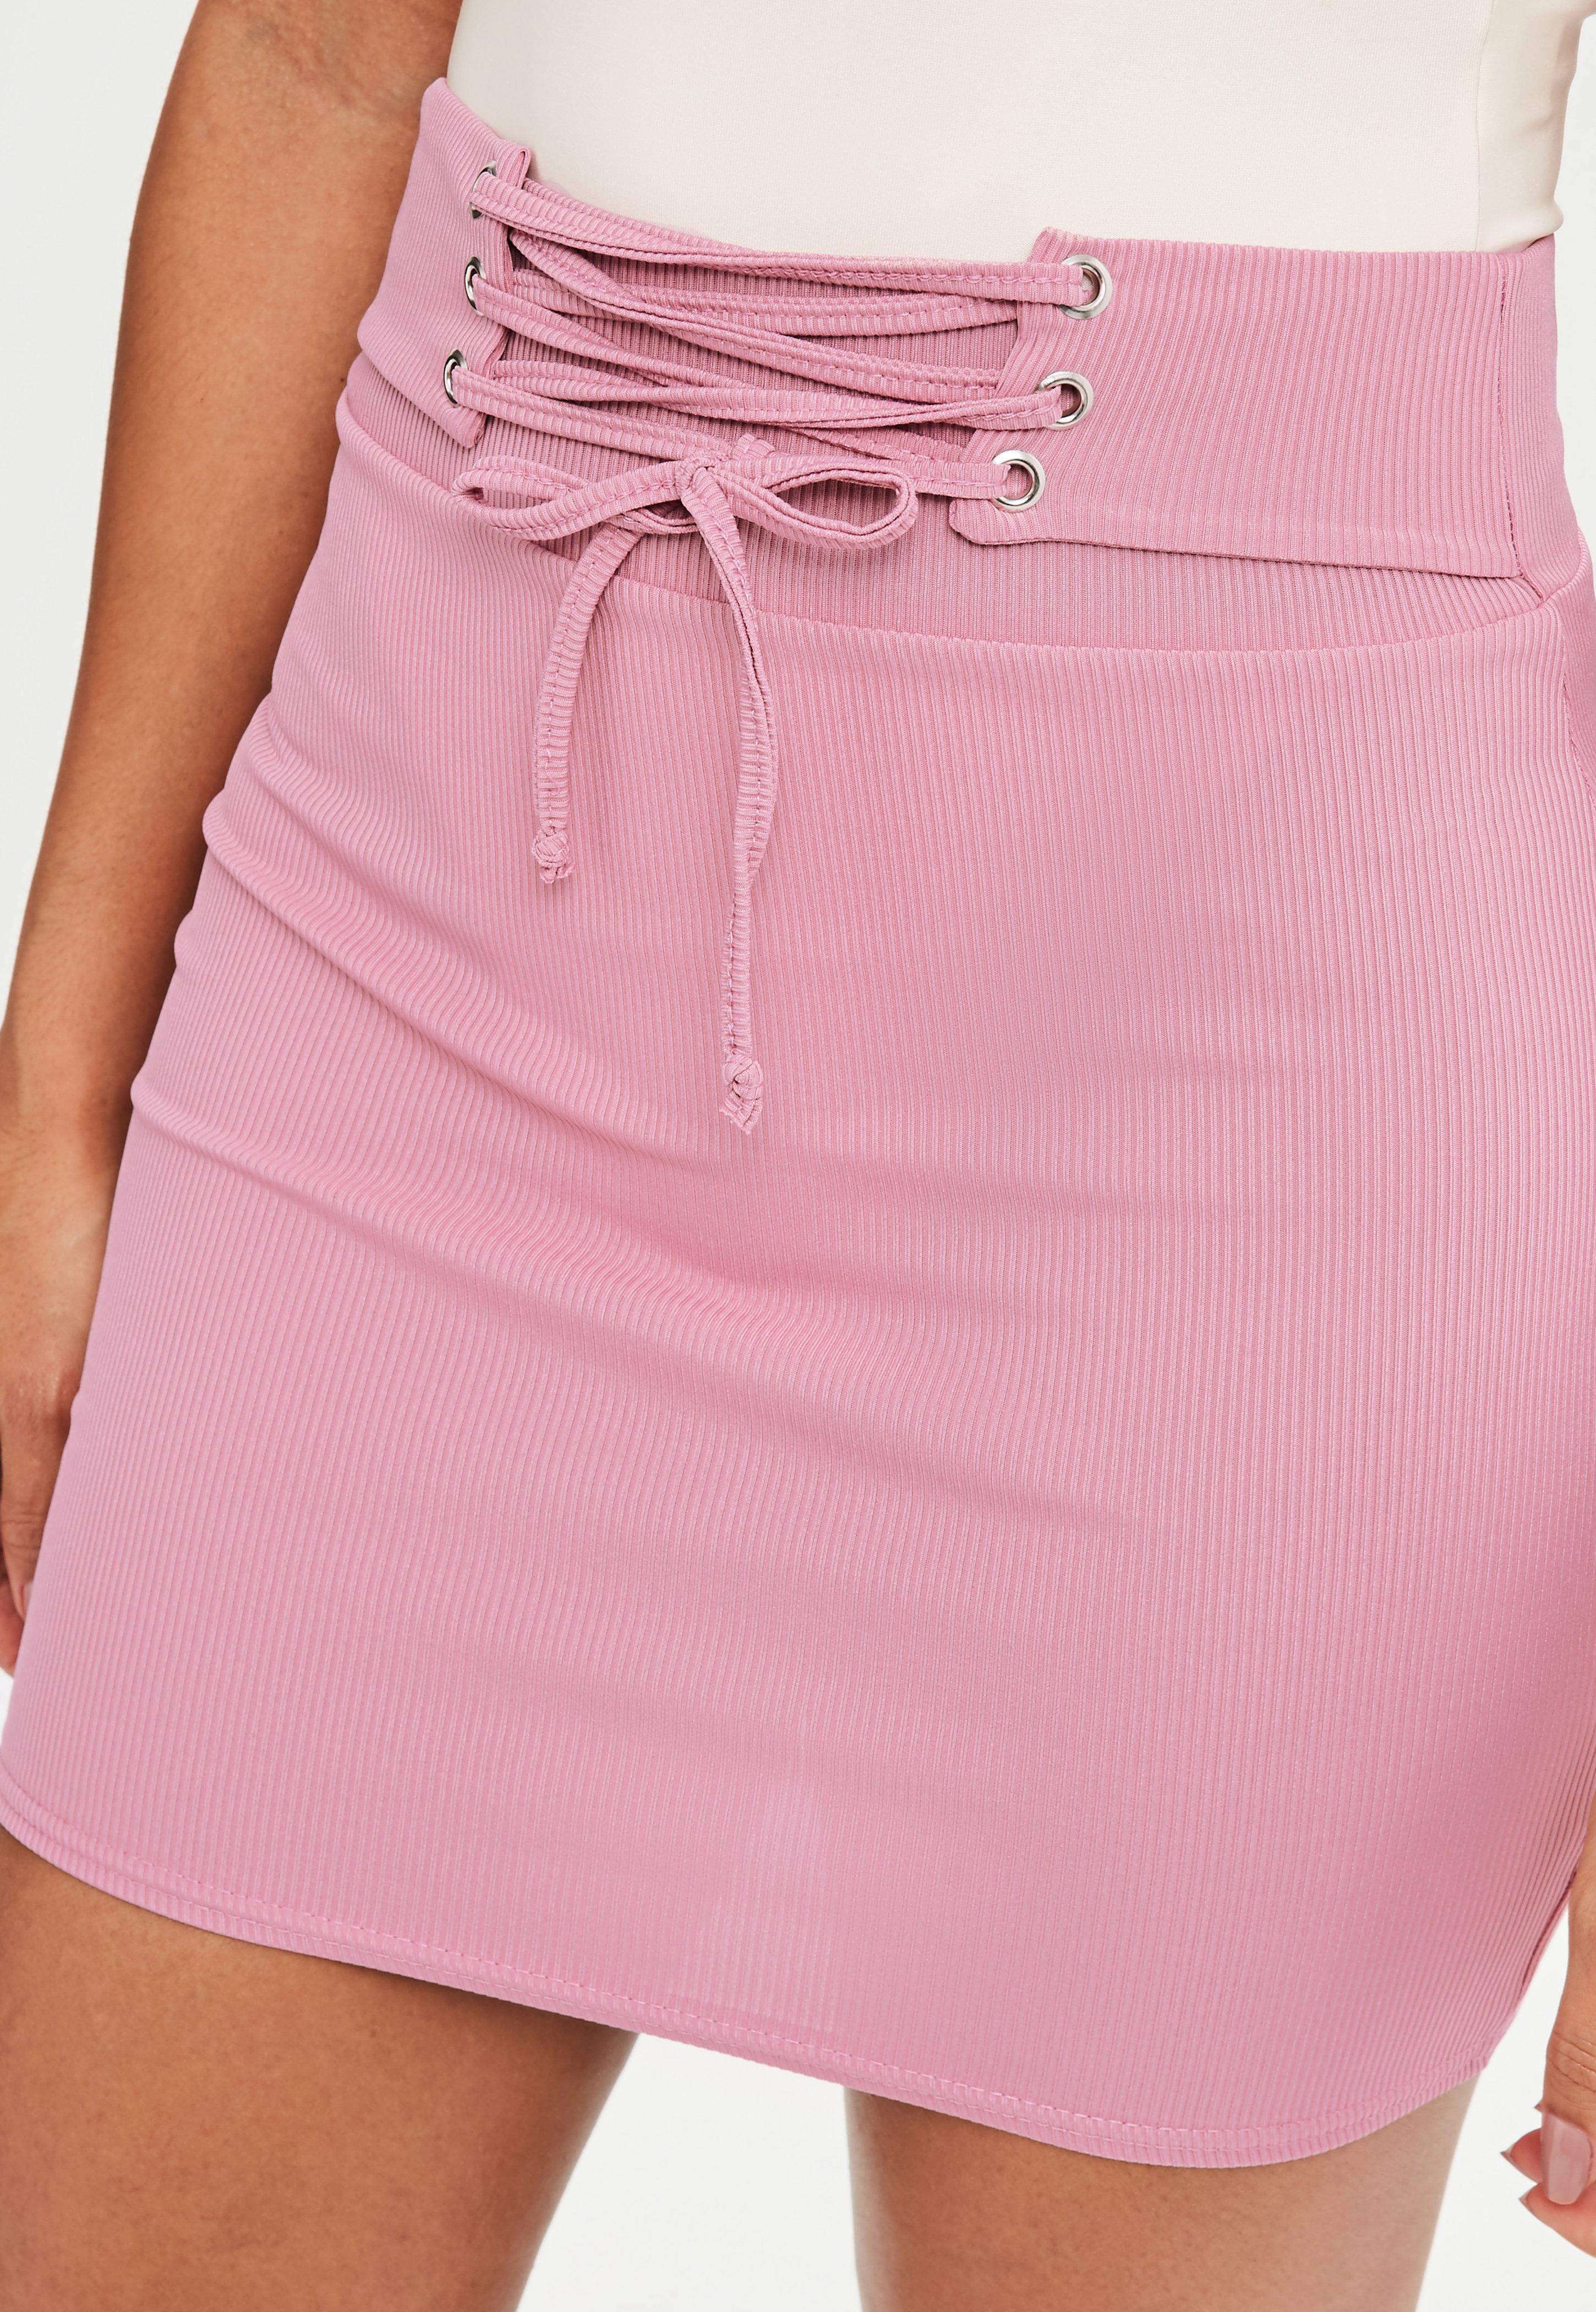 Pink mini skirt intolerable